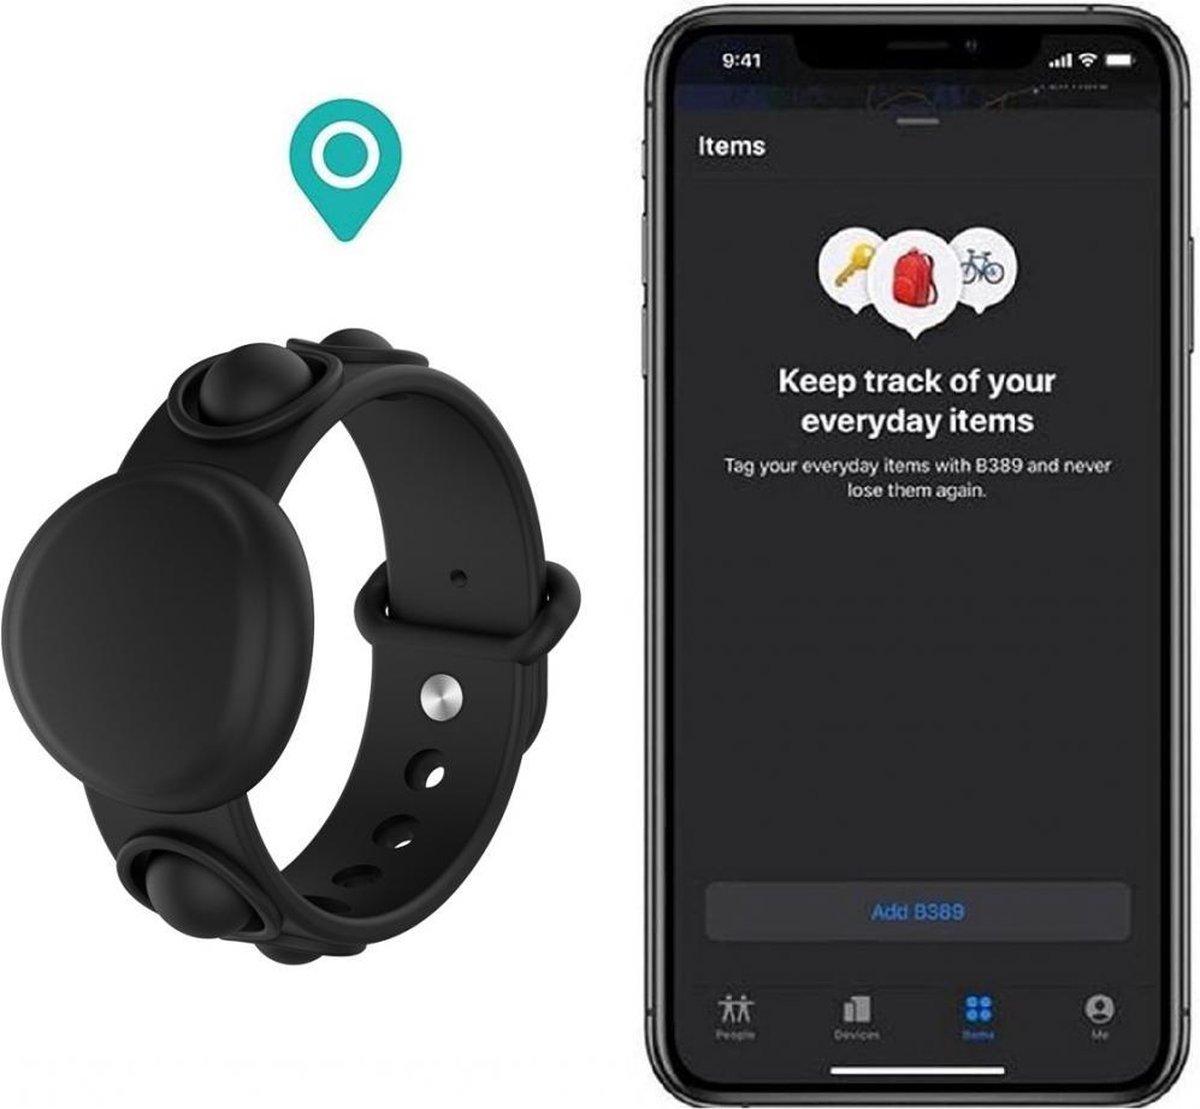 Luxe Siliconen Kinder Armband Voor Apple Airtag Tracker - Case Horloge Bandje Polsband Strap - Horloge Band - Watchband - Horlogeband - Zweet & Weerbestendig - Kids Tracker - Zwart